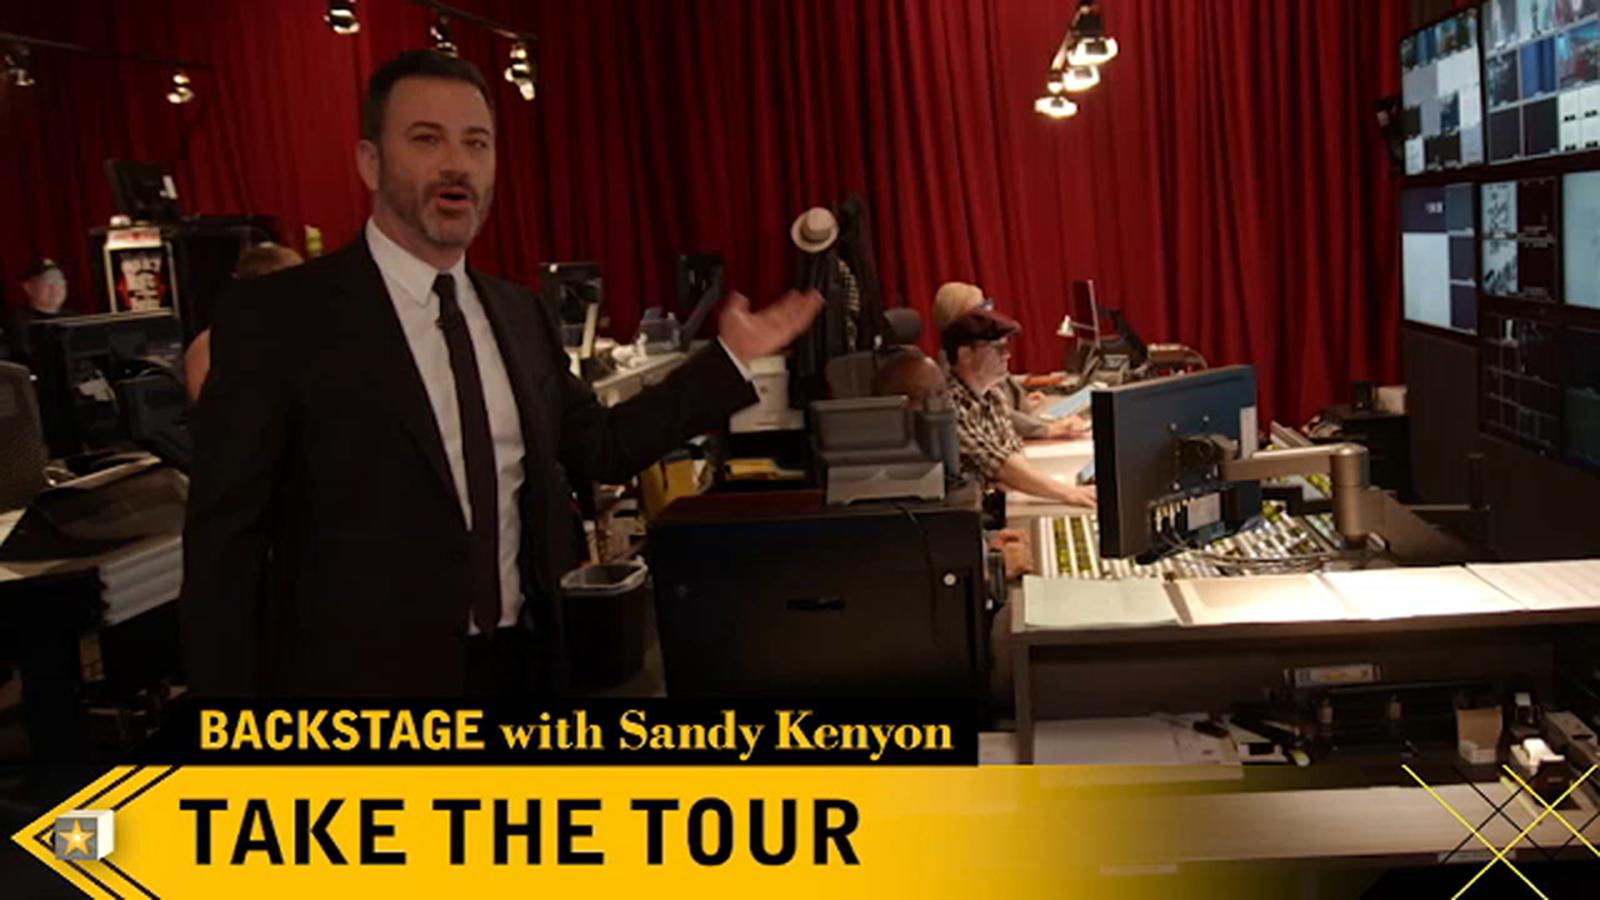 Backstage with Sandy Kenyon: Jimmy Kimmel's Hollywood studio